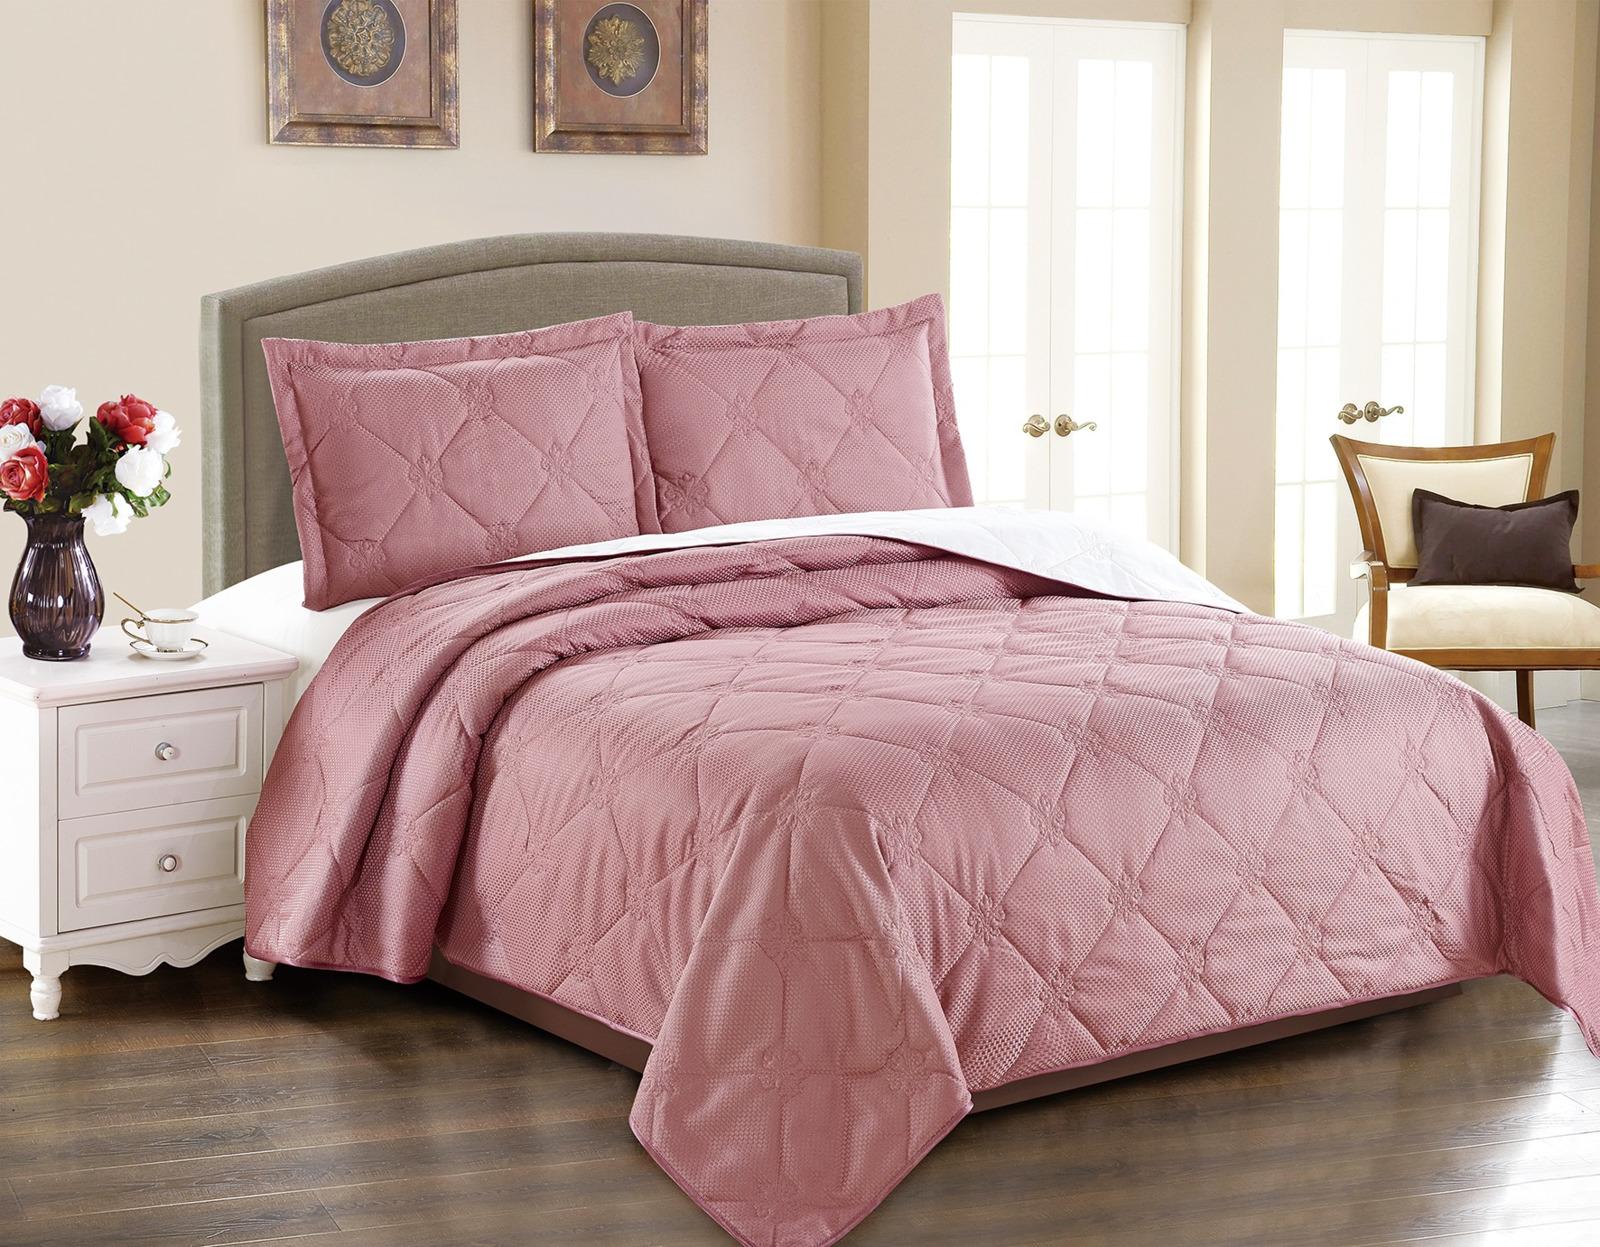 Покрывало с наволочками Cleo Runa, 220/006-RA, темно-розовый, 220 х 240 см, наволочки 50х70+5